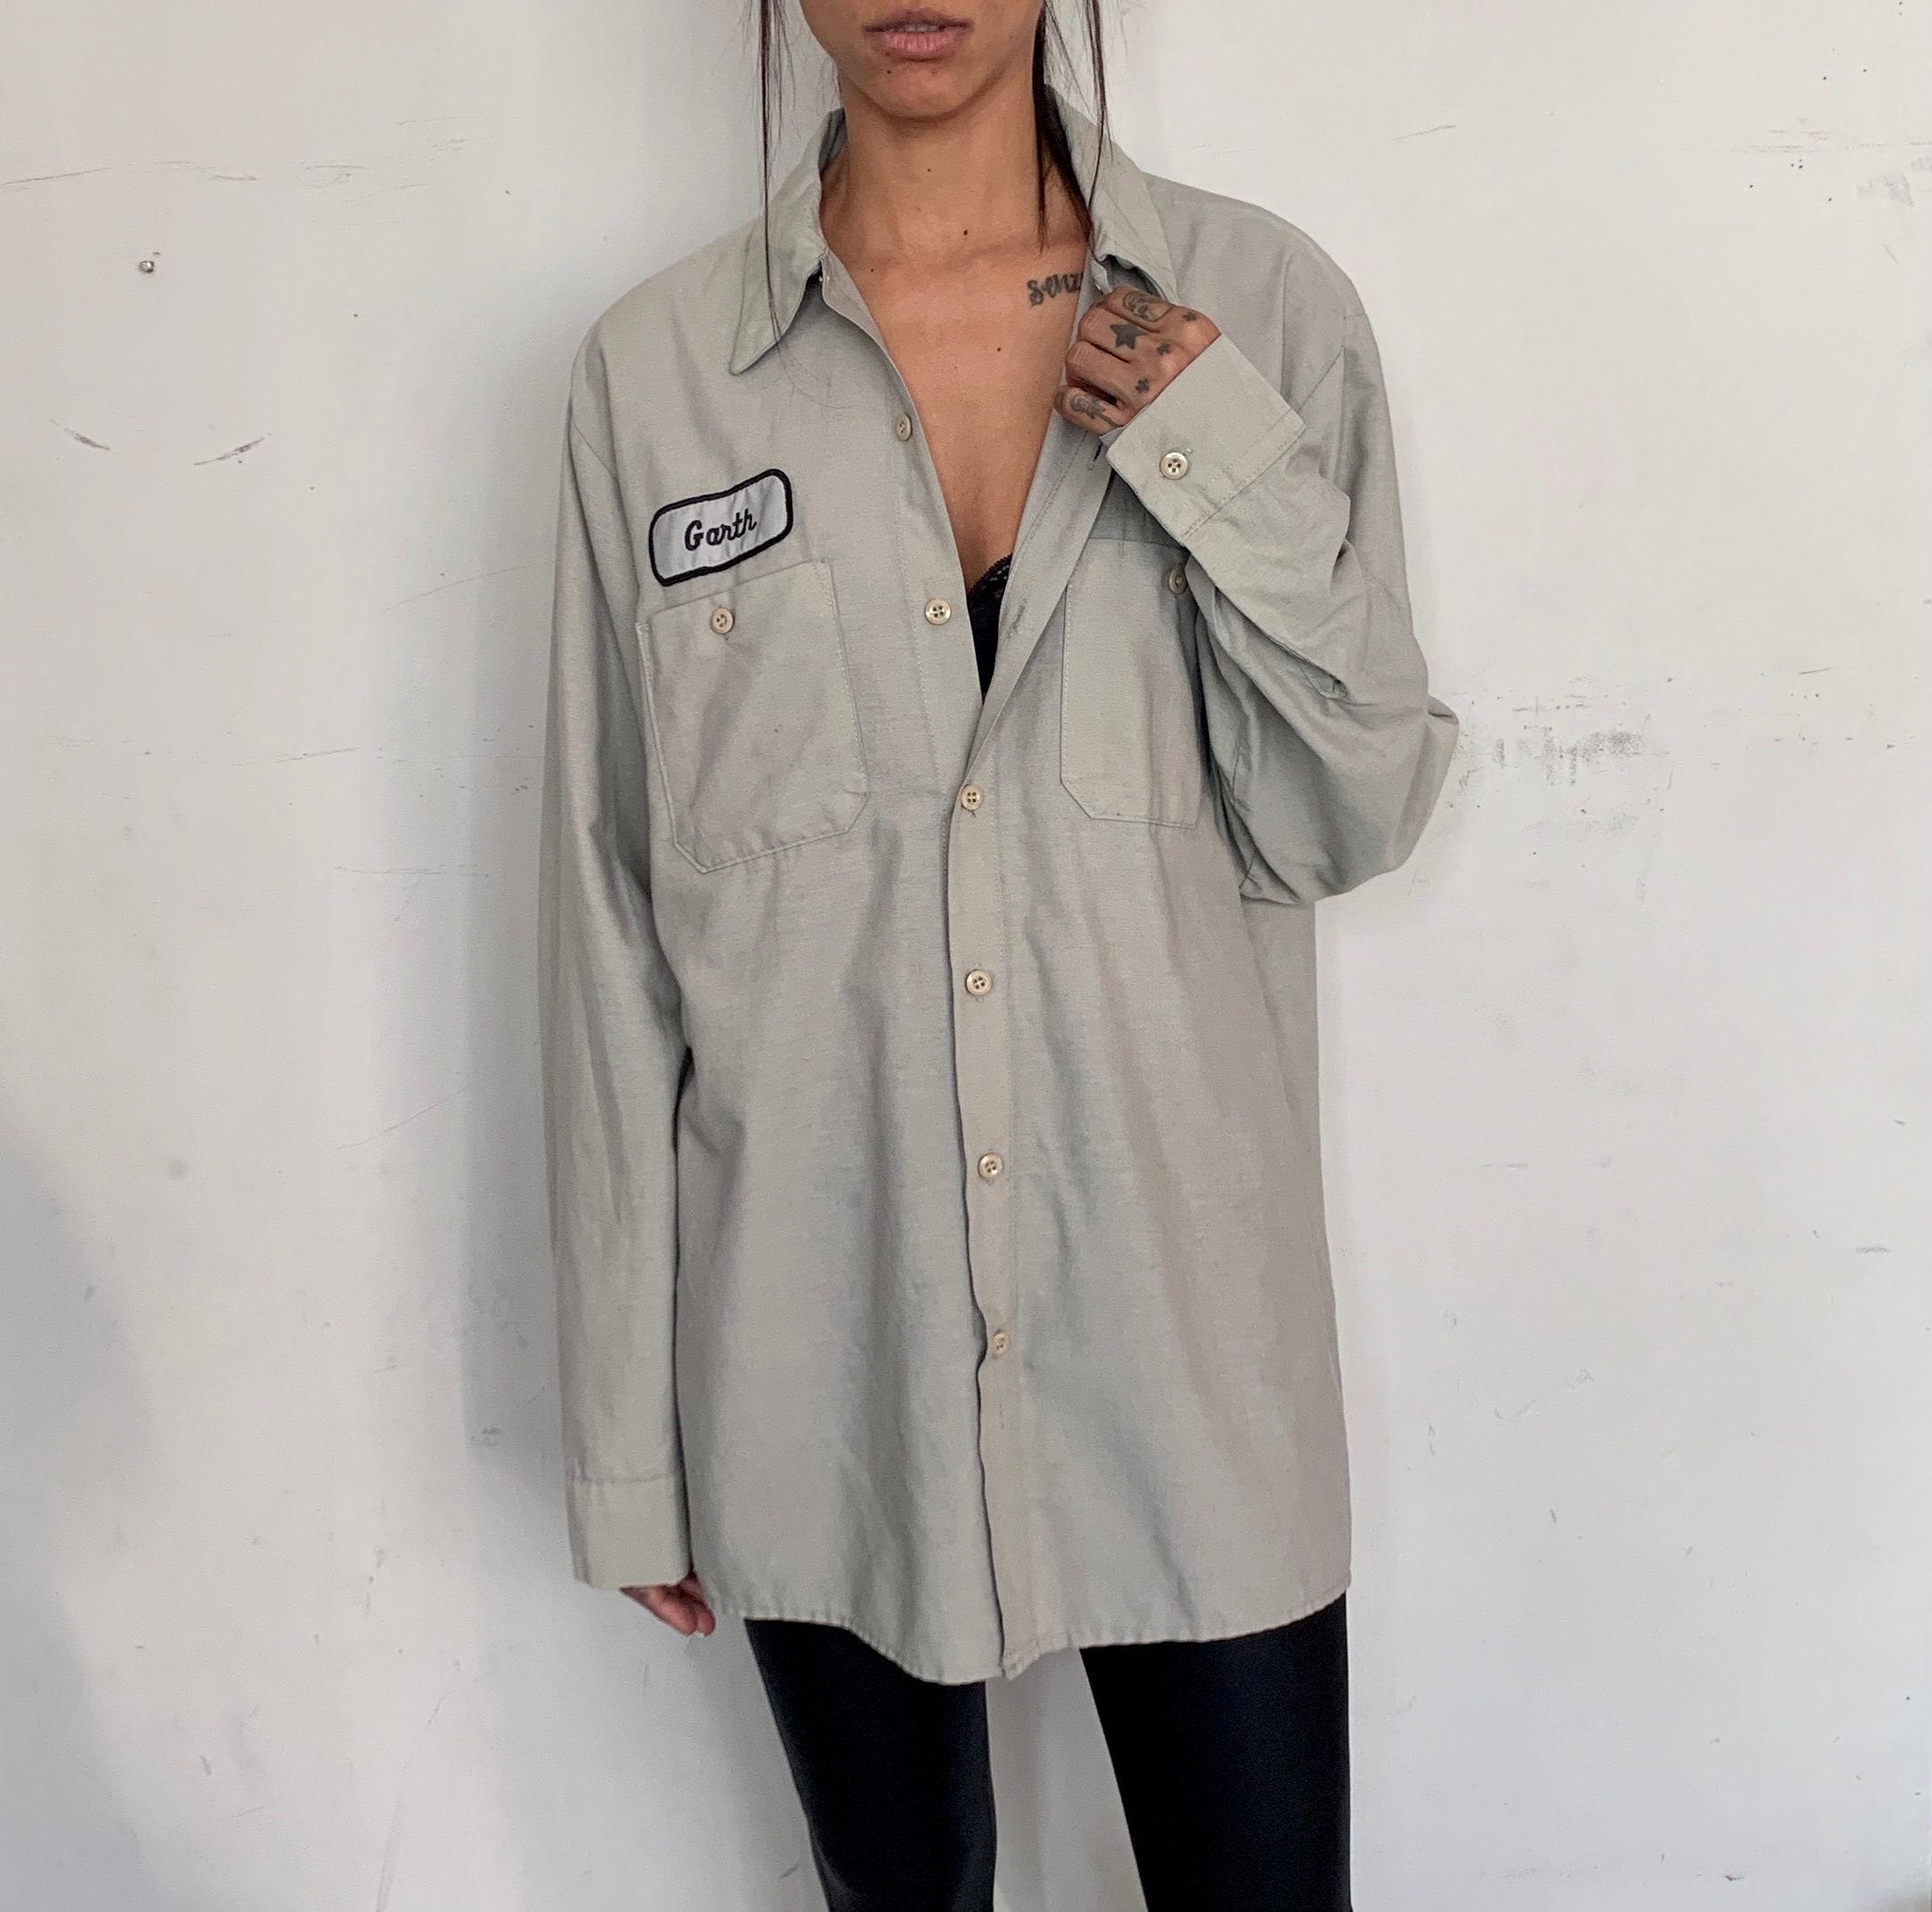 80s Tops, Shirts, T-shirts, Blouse   90s T-shirts Rare Distressed Work Shirt, Garth $95.00 AT vintagedancer.com